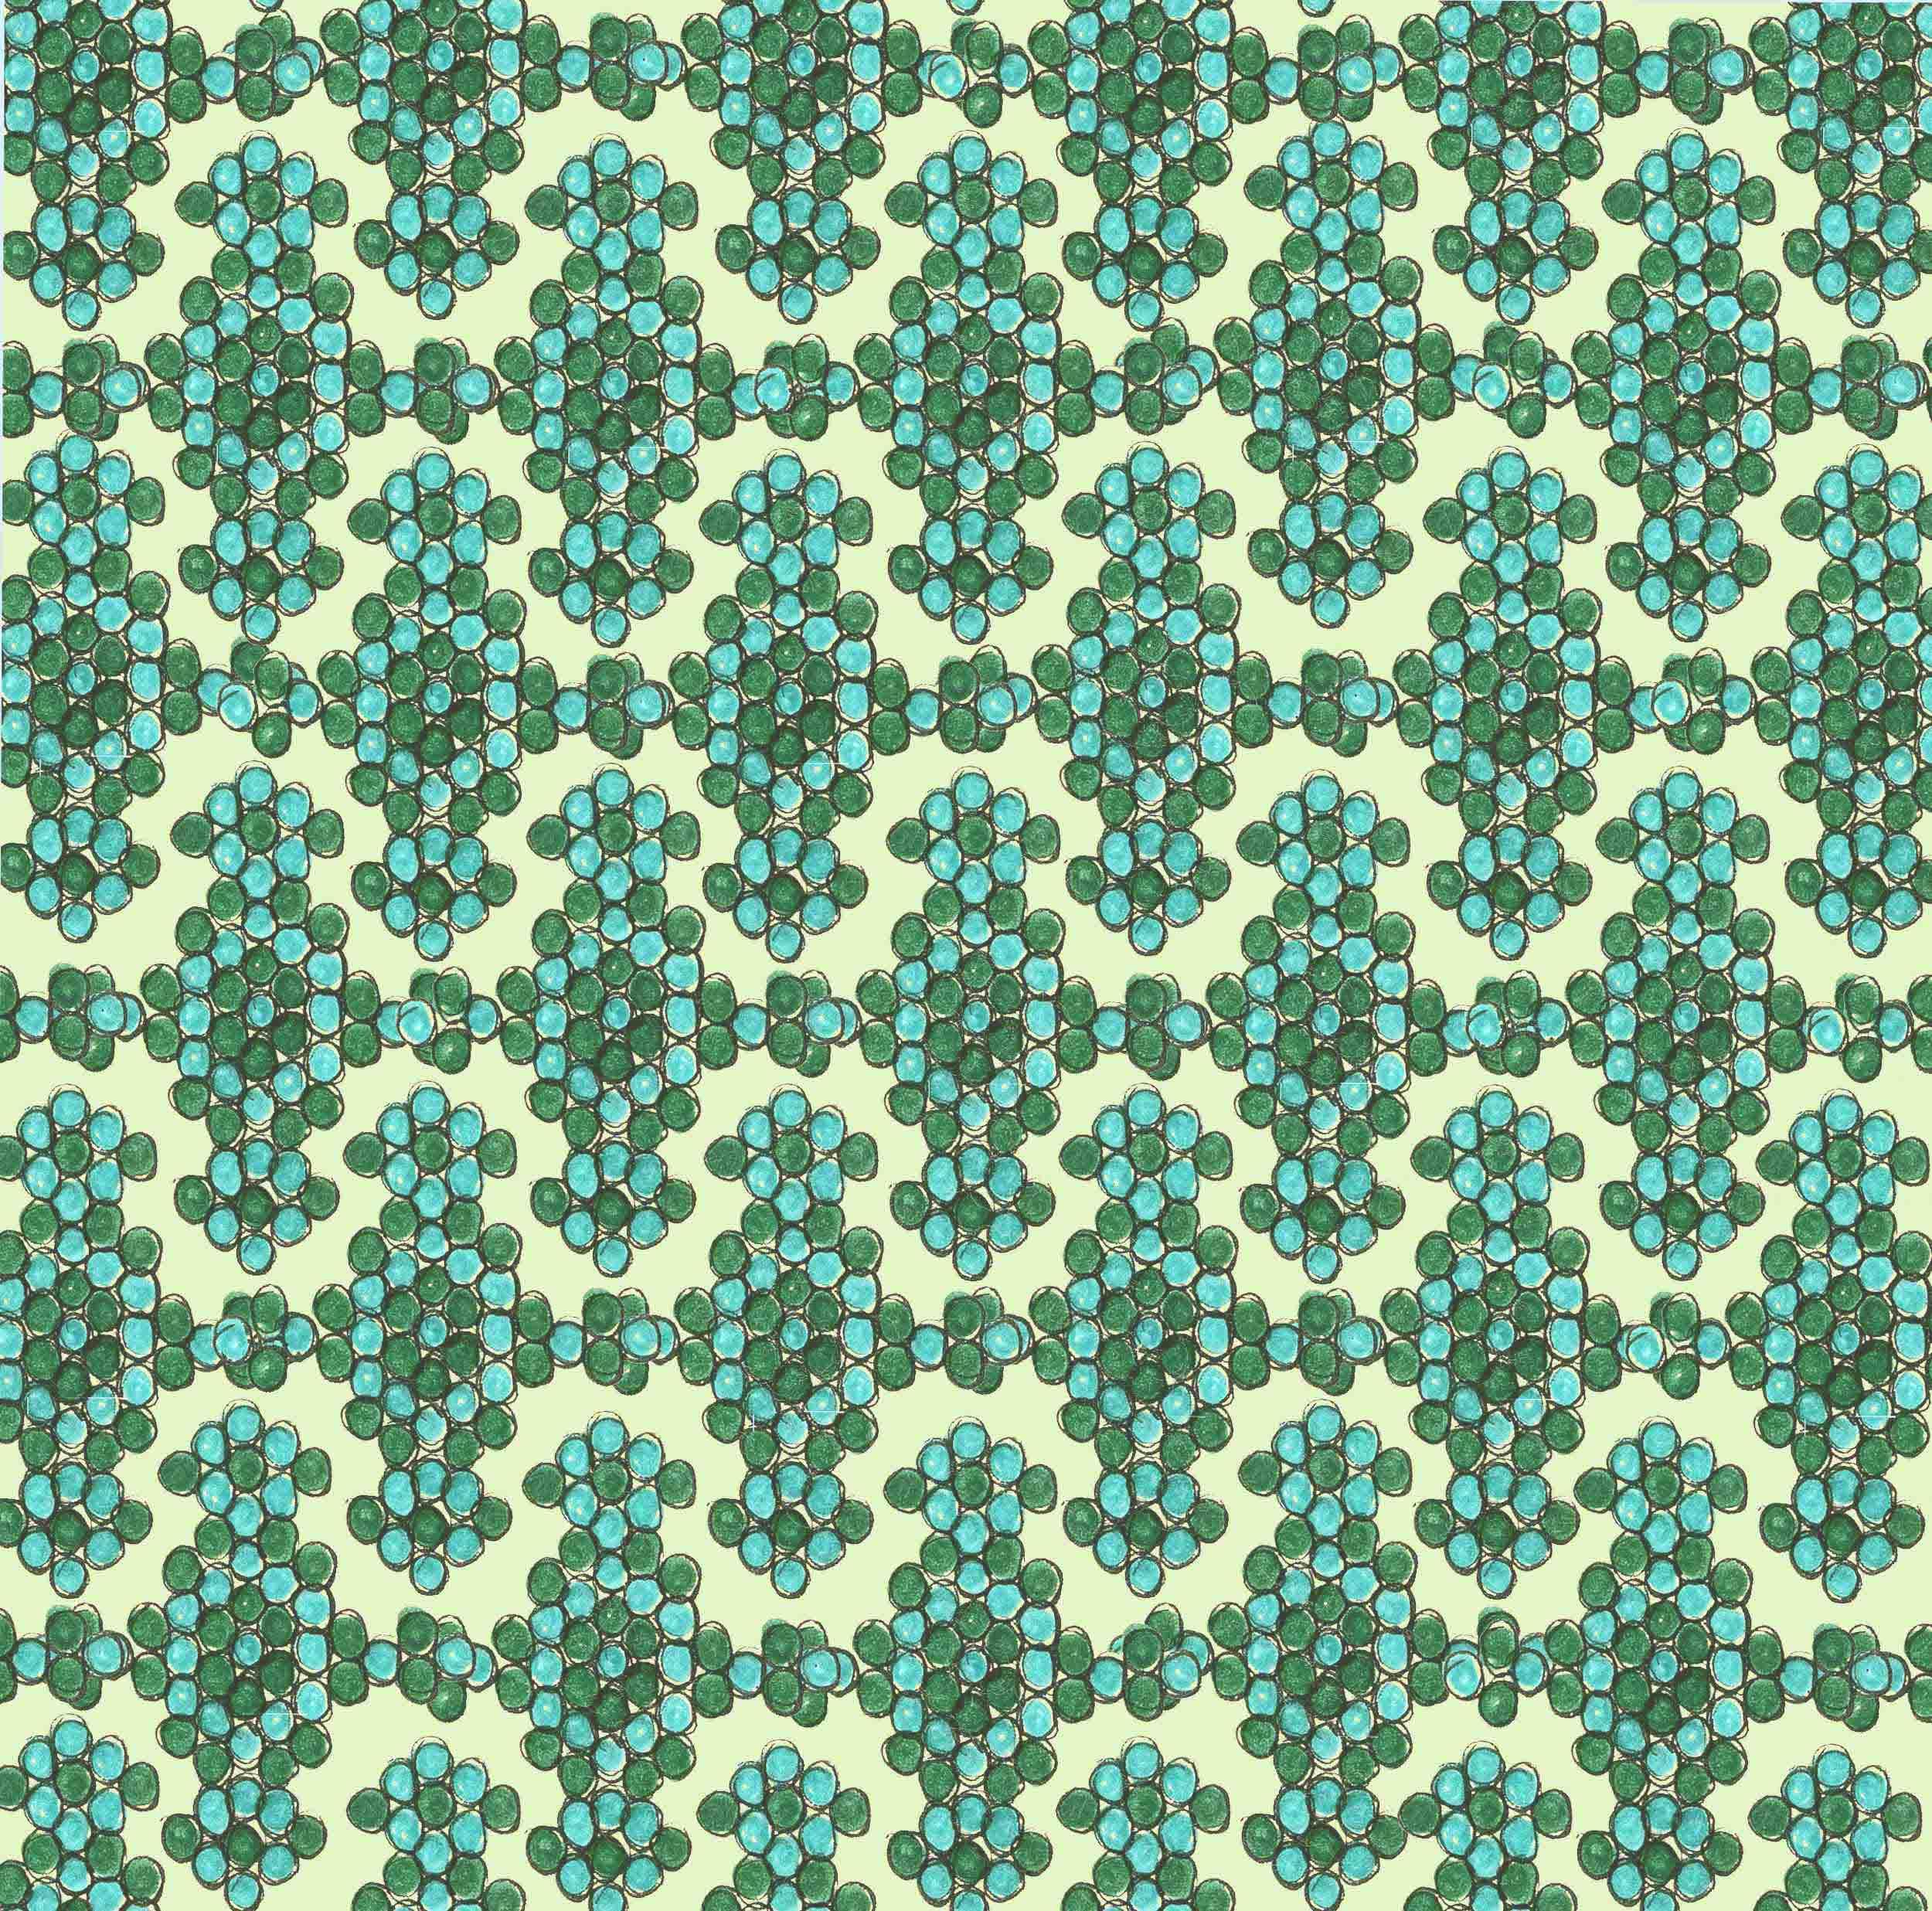 blue-green overall.jpg